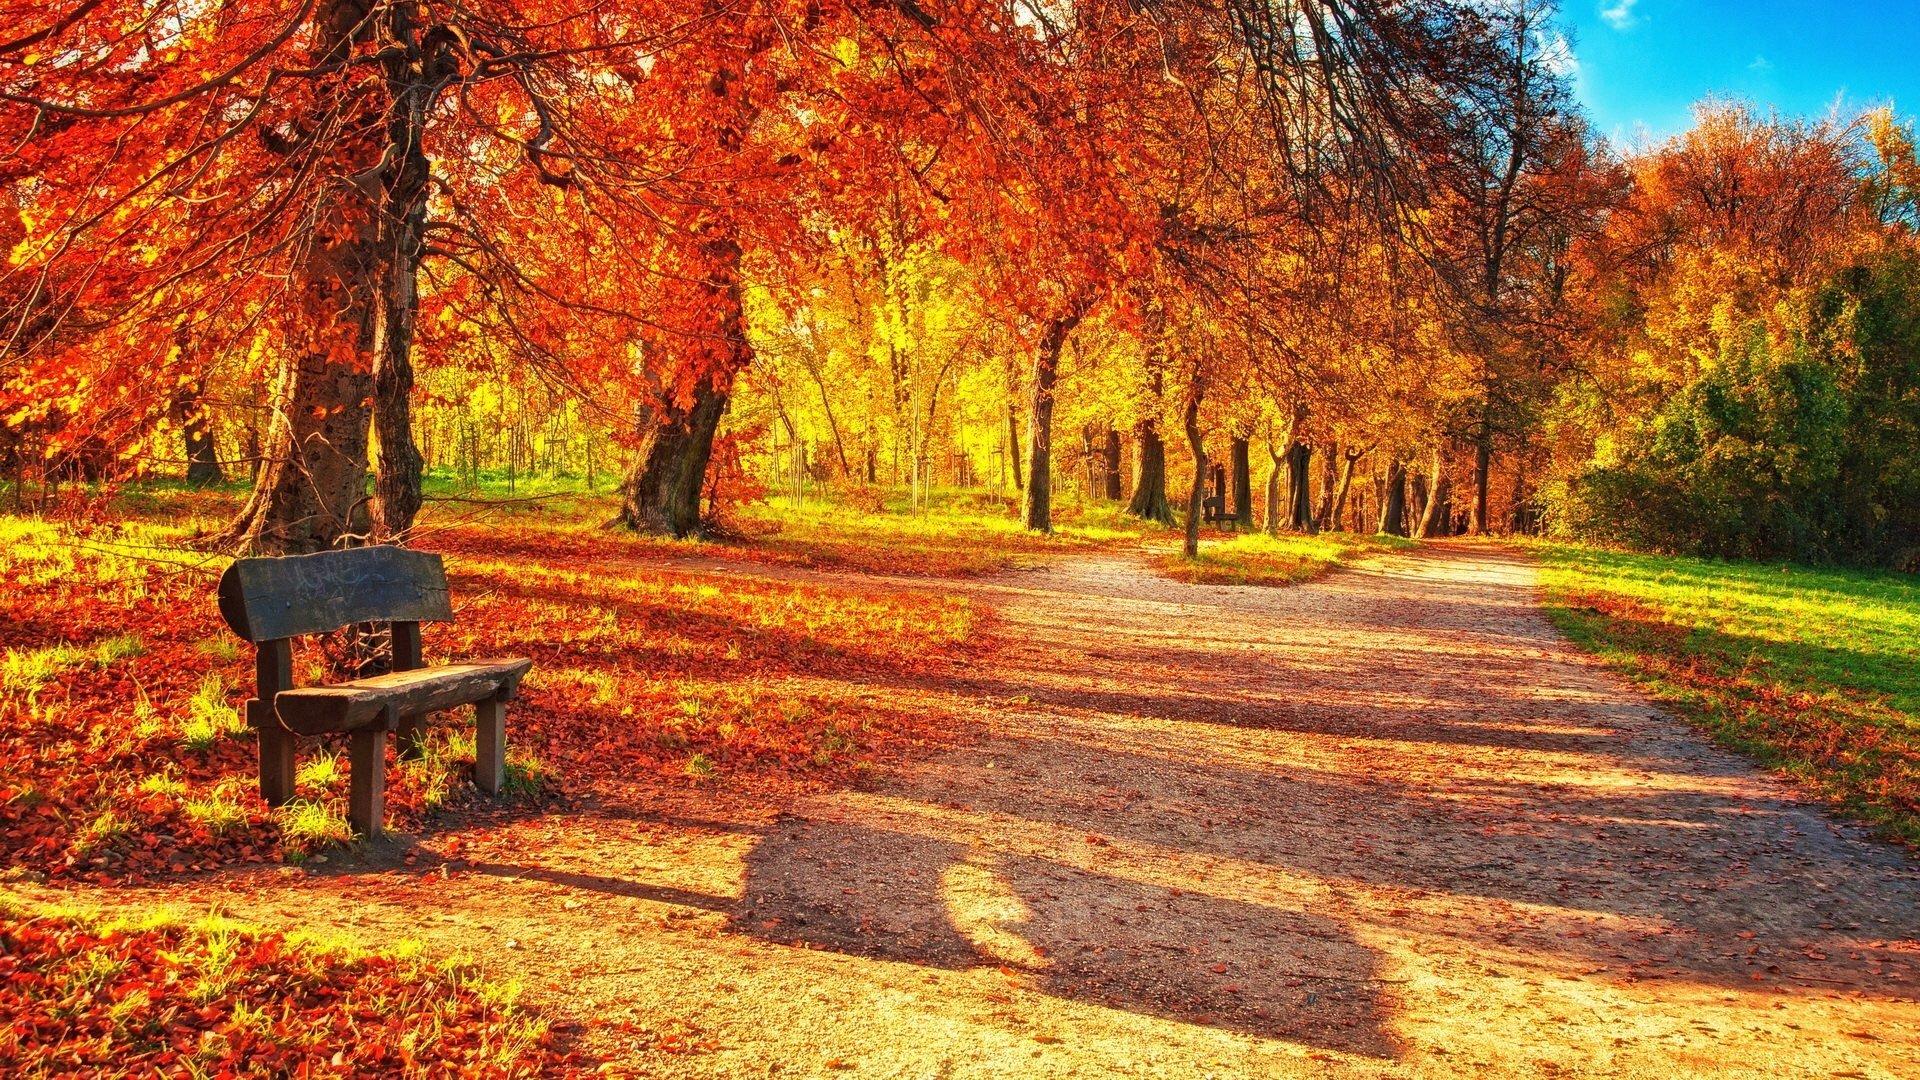 Cute Fall Wallpaper Download